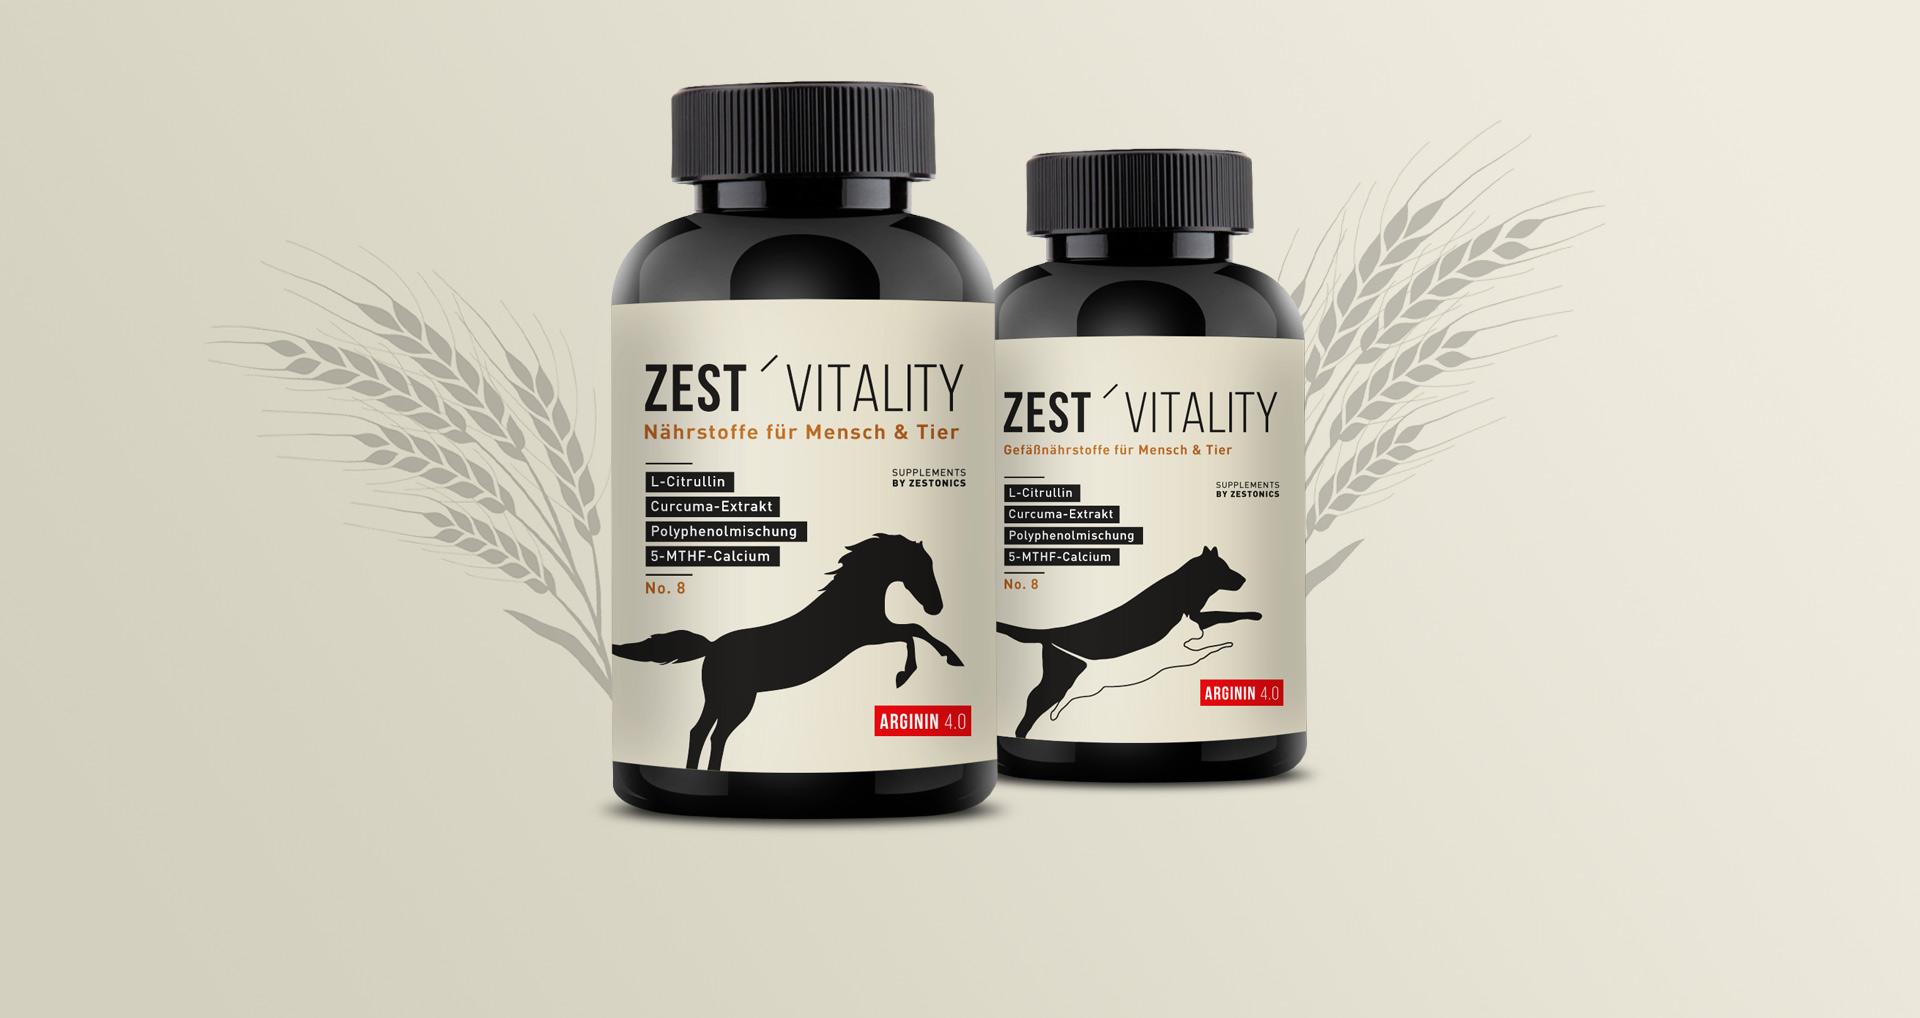 Zest'Vitality von Zestonics